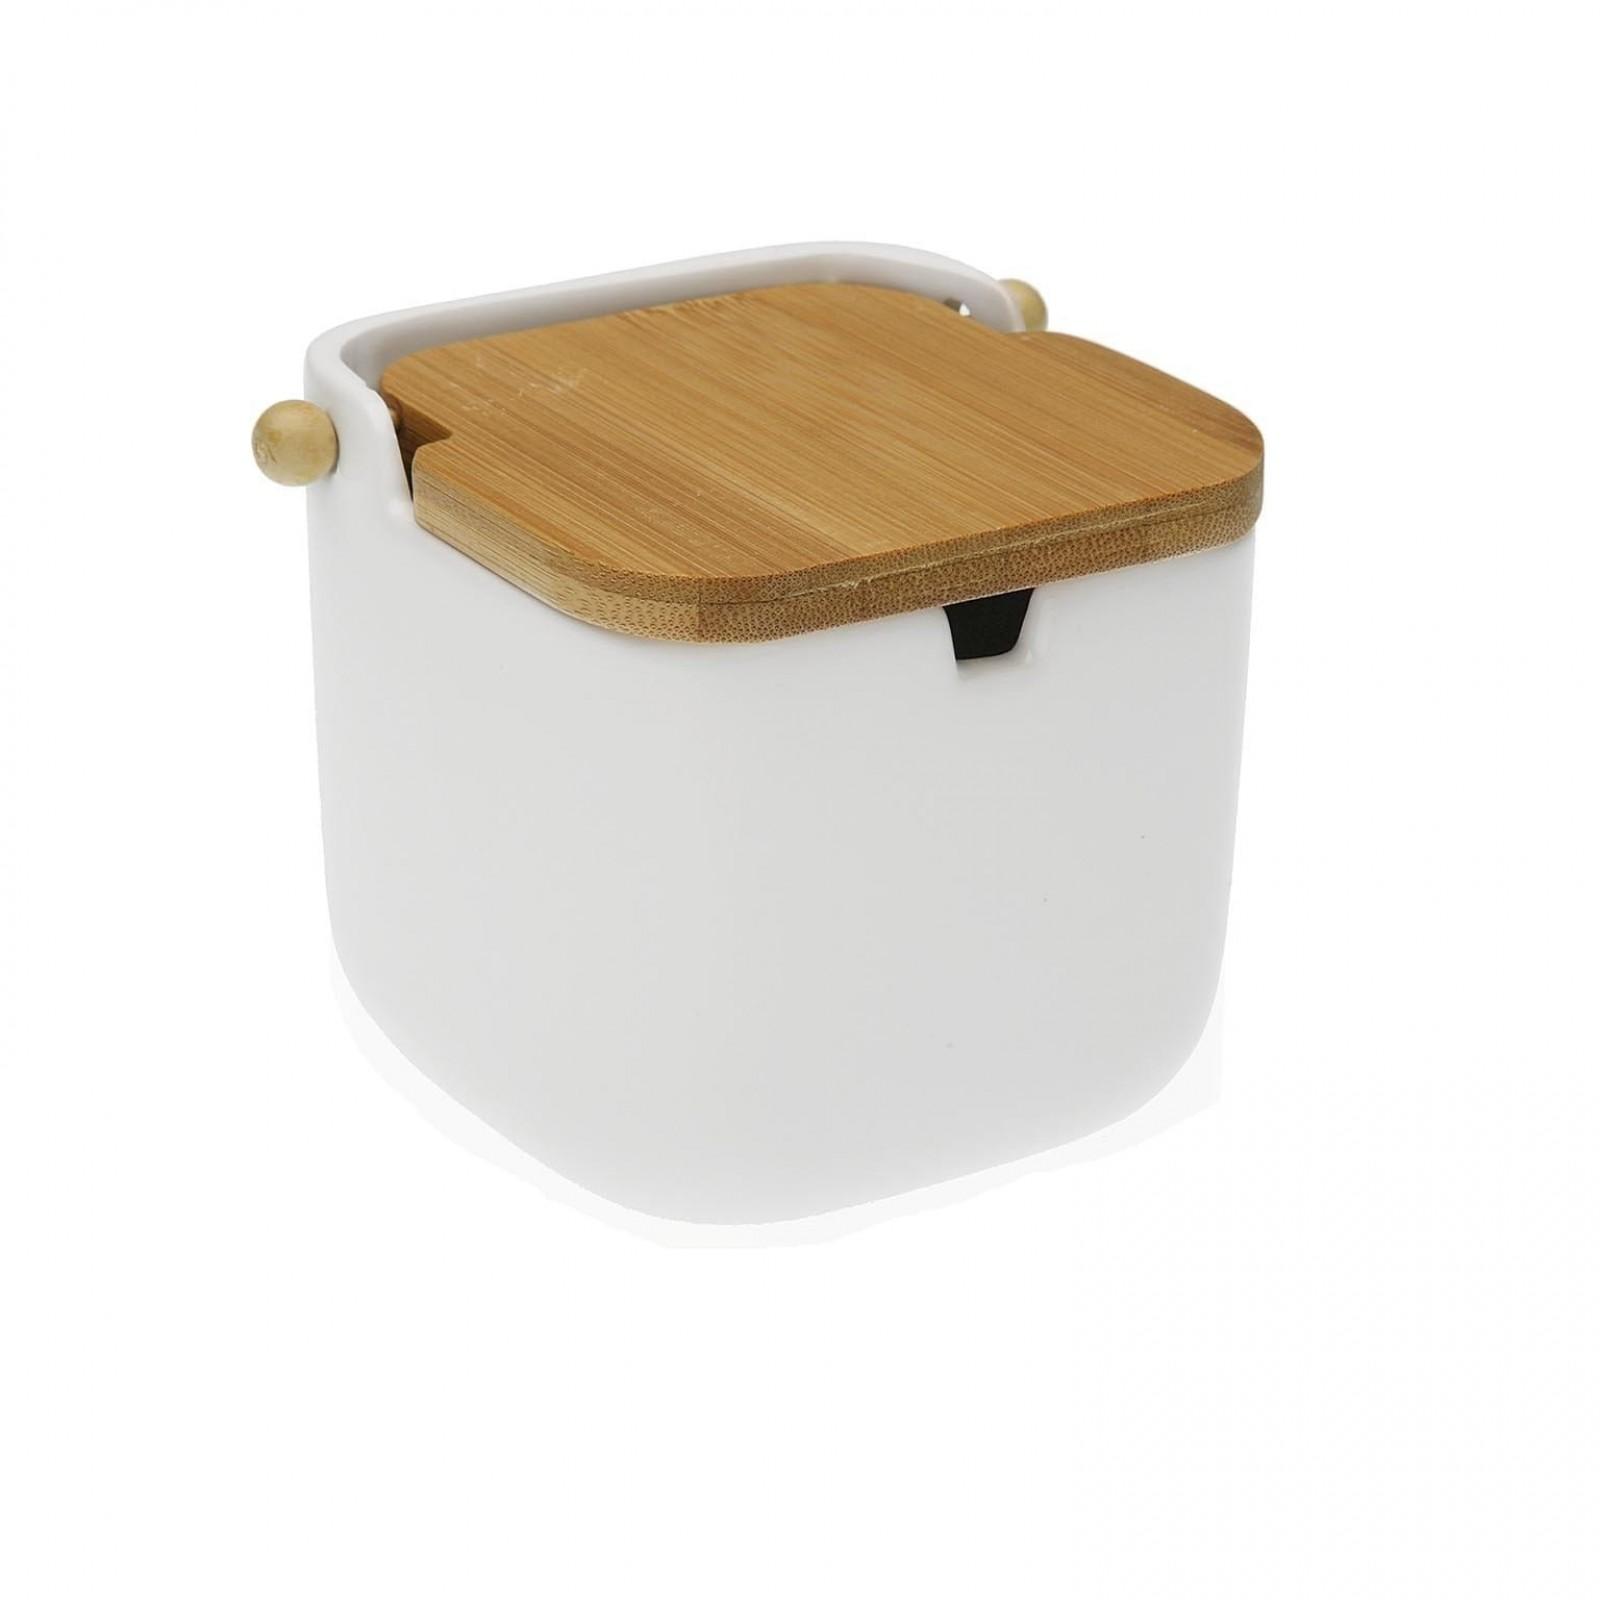 Joe Bamboo Lid Sugar Bowl (White) - Versa